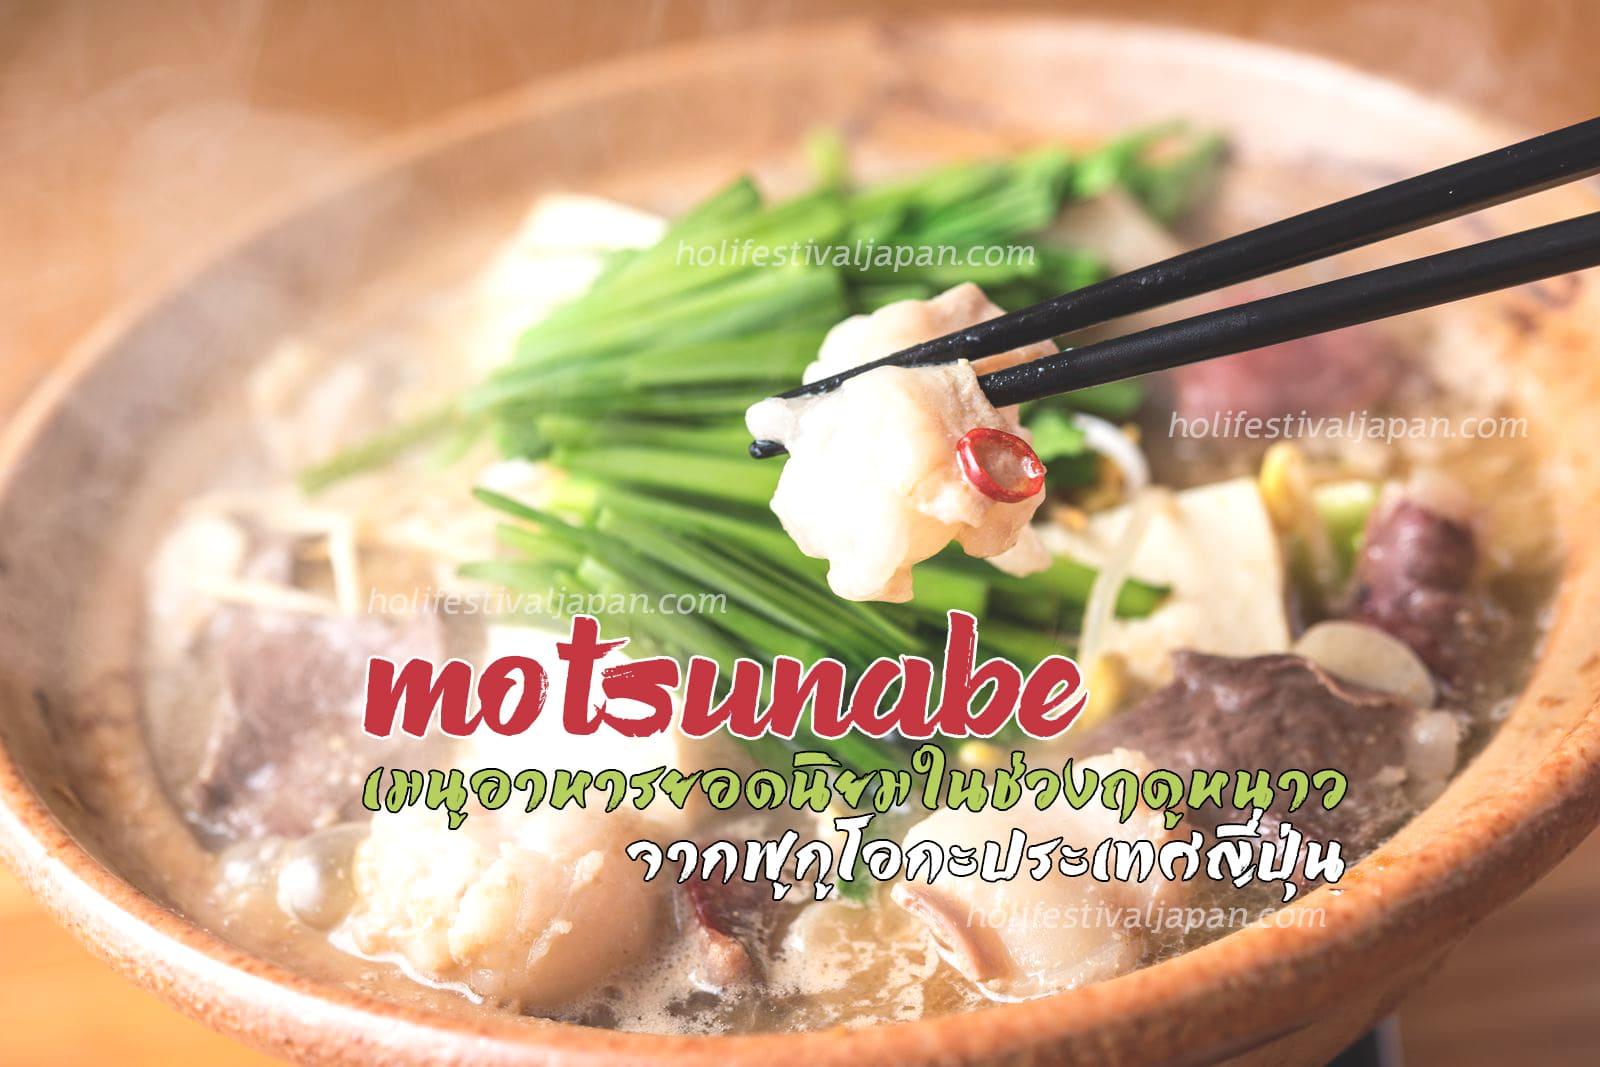 Motsunabe เมนูอาหารยอดนิยมในช่วงฤดูหนาว จากฟูกูโอกะ ประเทศญี่ปุ่น